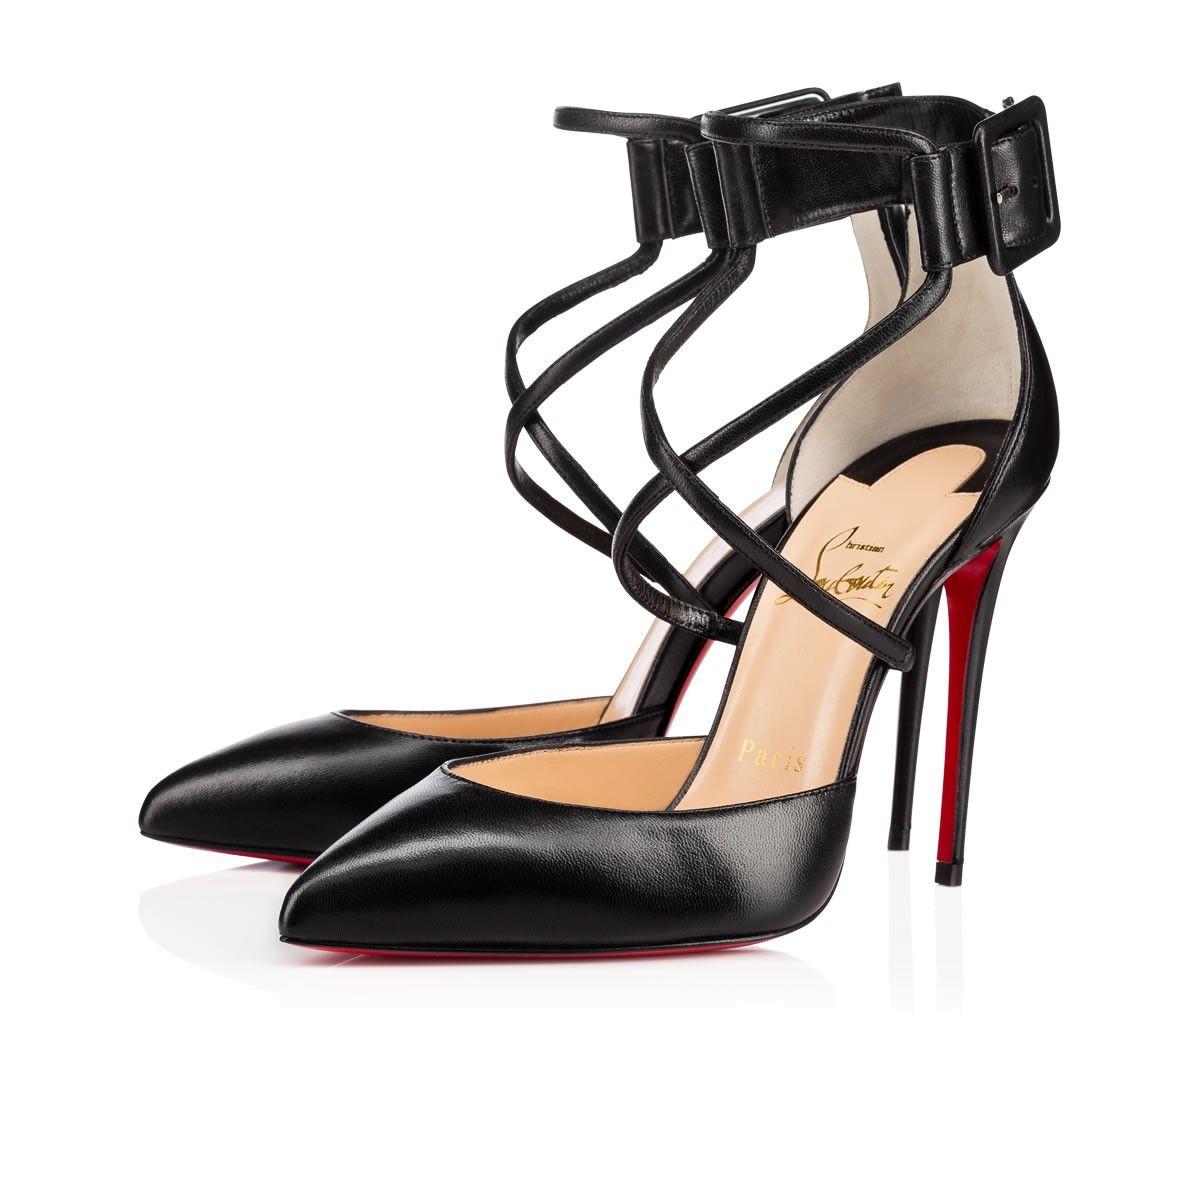 Women Shoes - Suzanna Nappa Shiny - Christian Louboutin